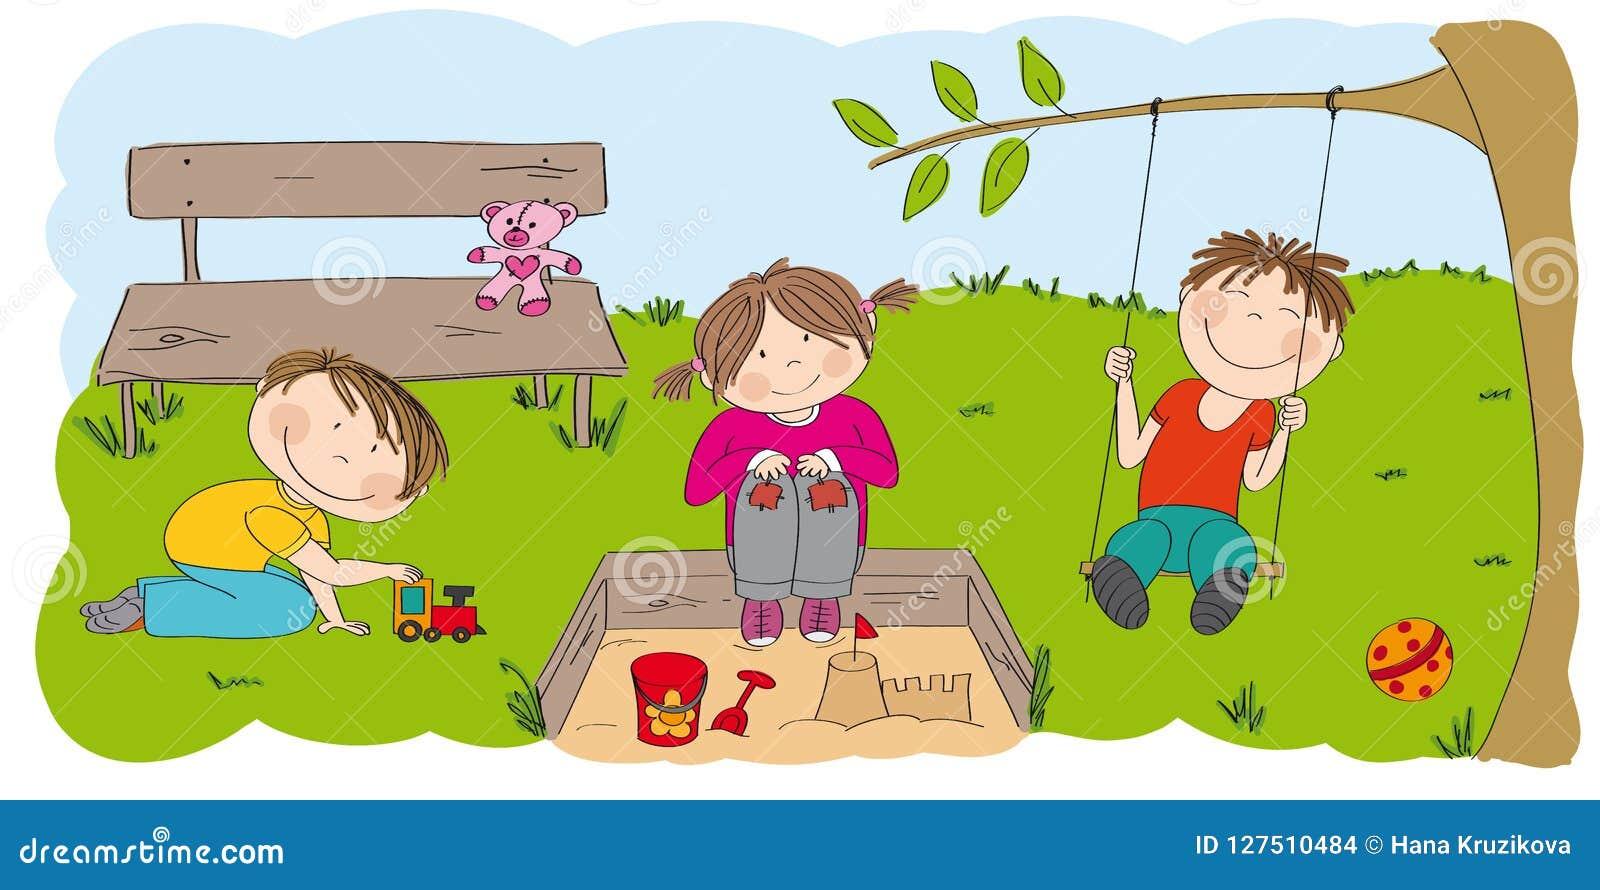 Happy preschool children playing outside in the park / garden.